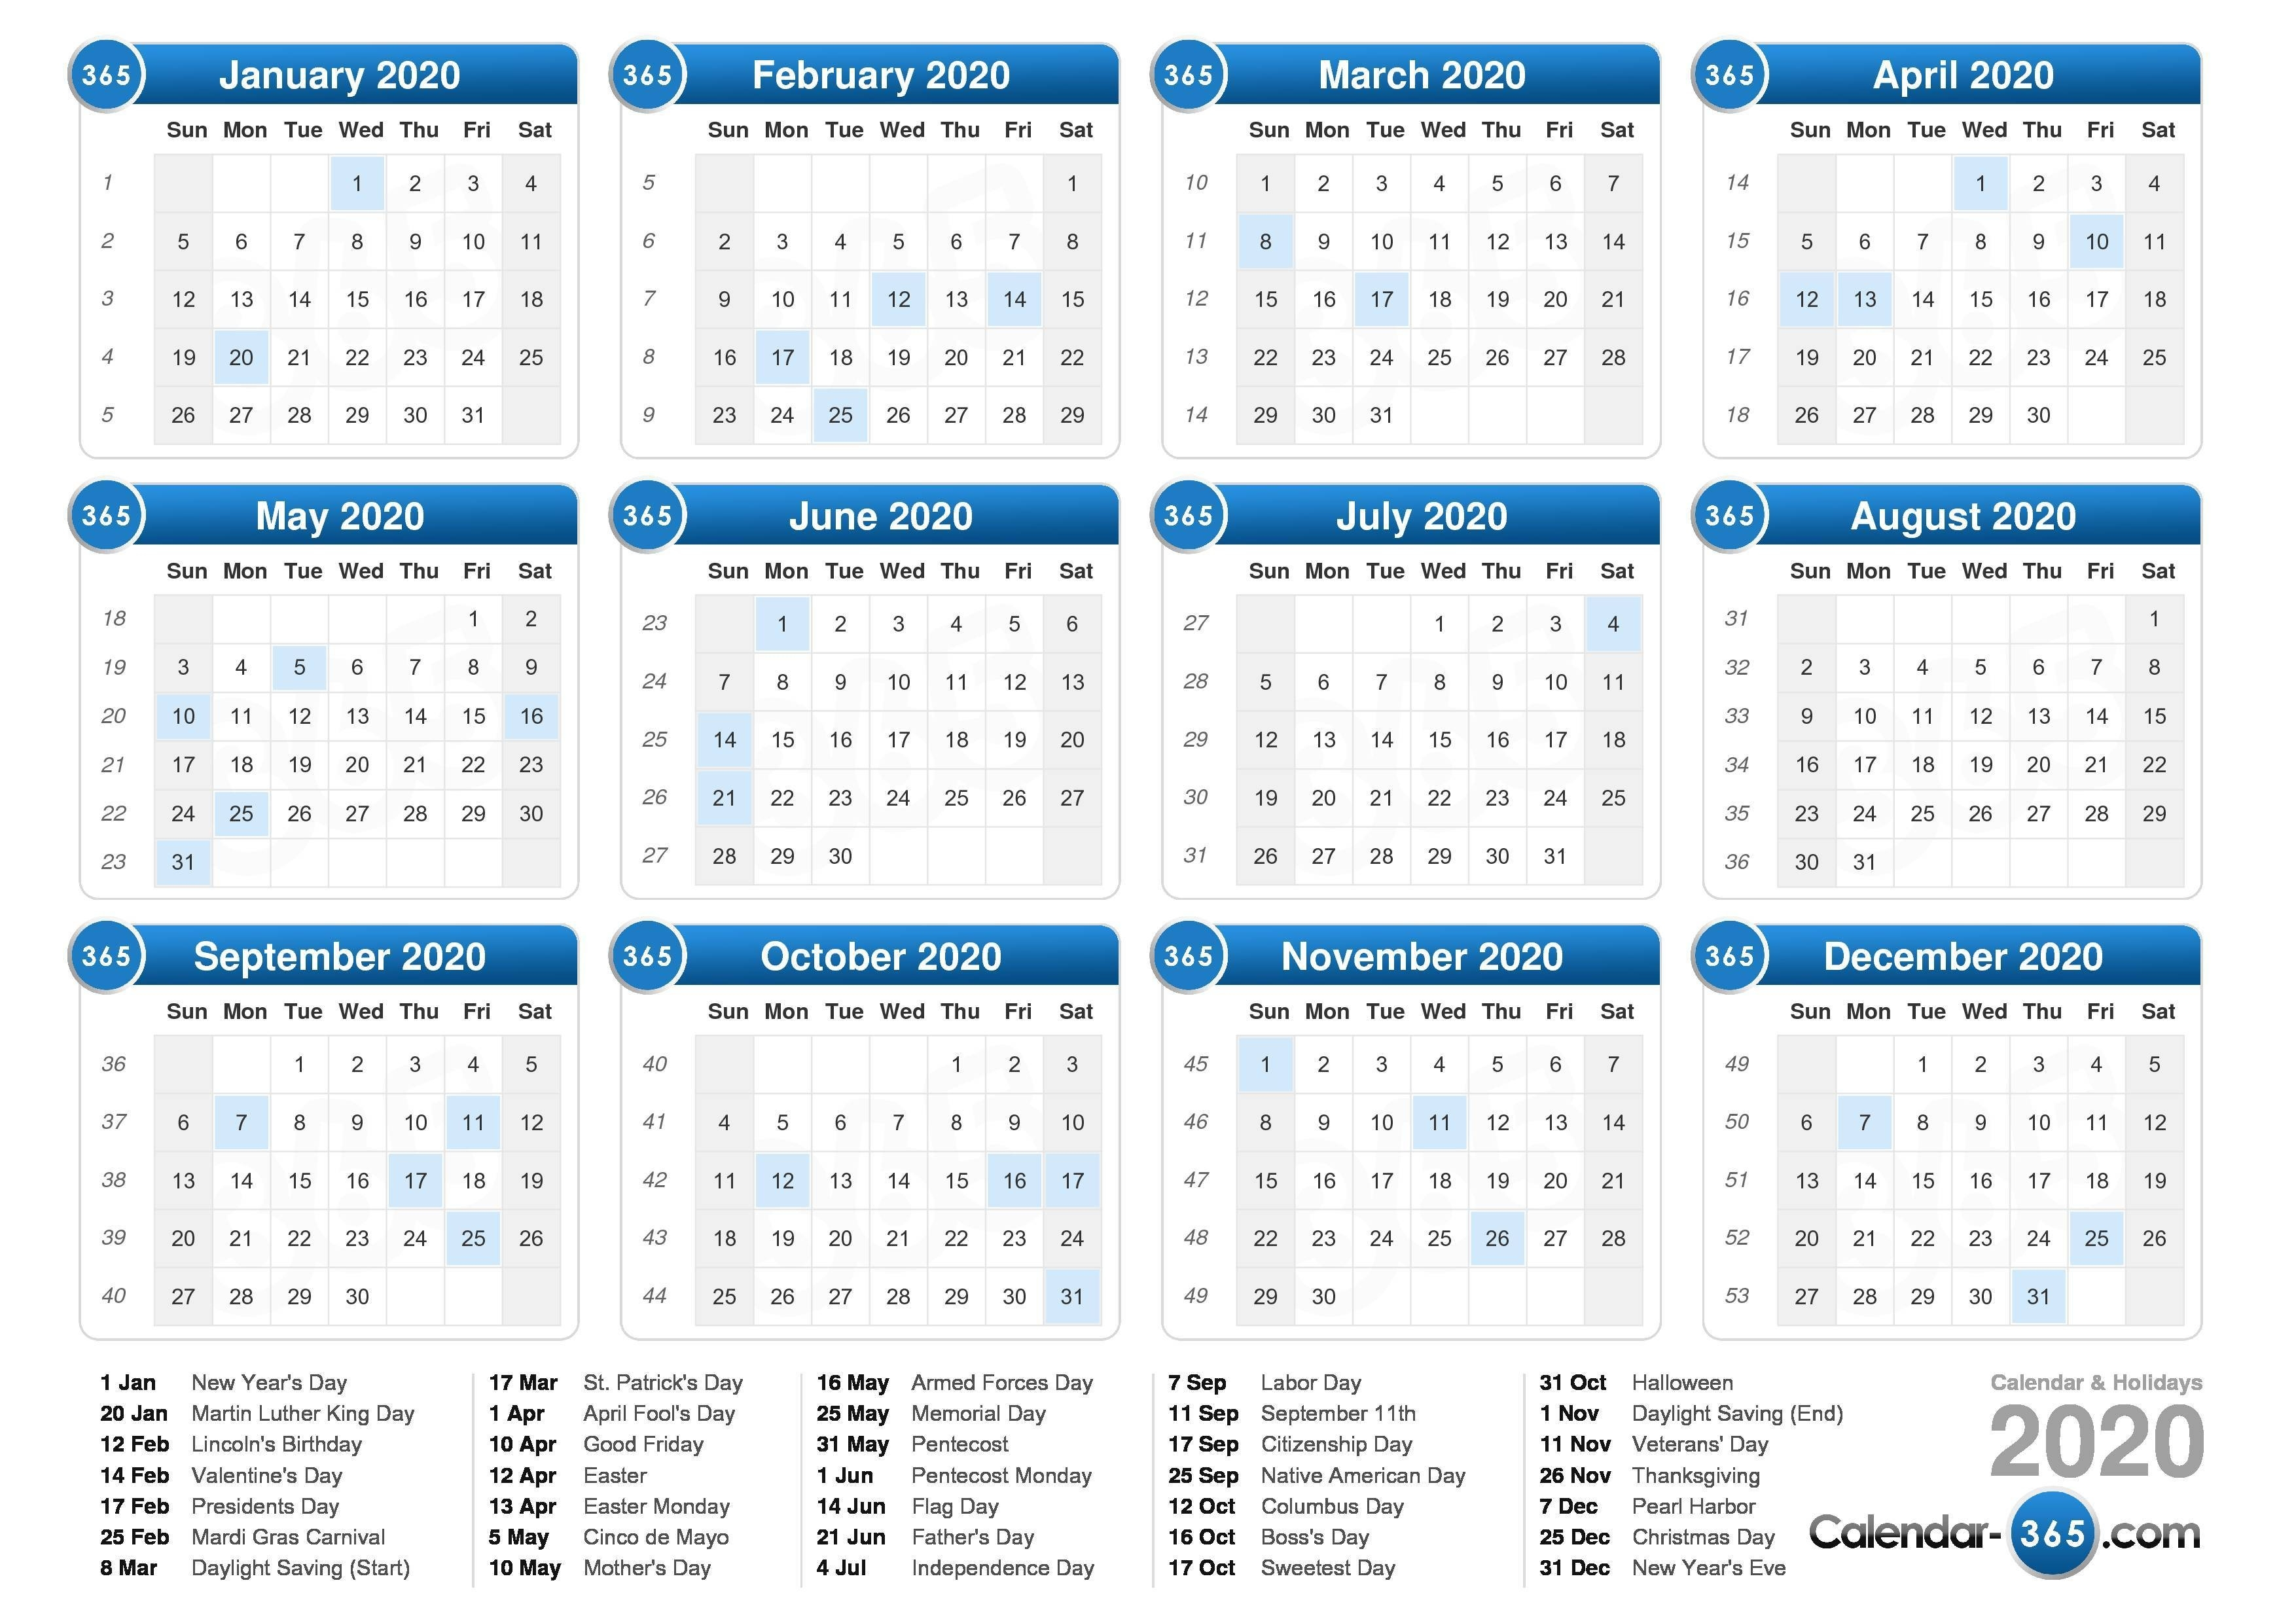 2020 Calendar-Calendar With Public Holidays 2020